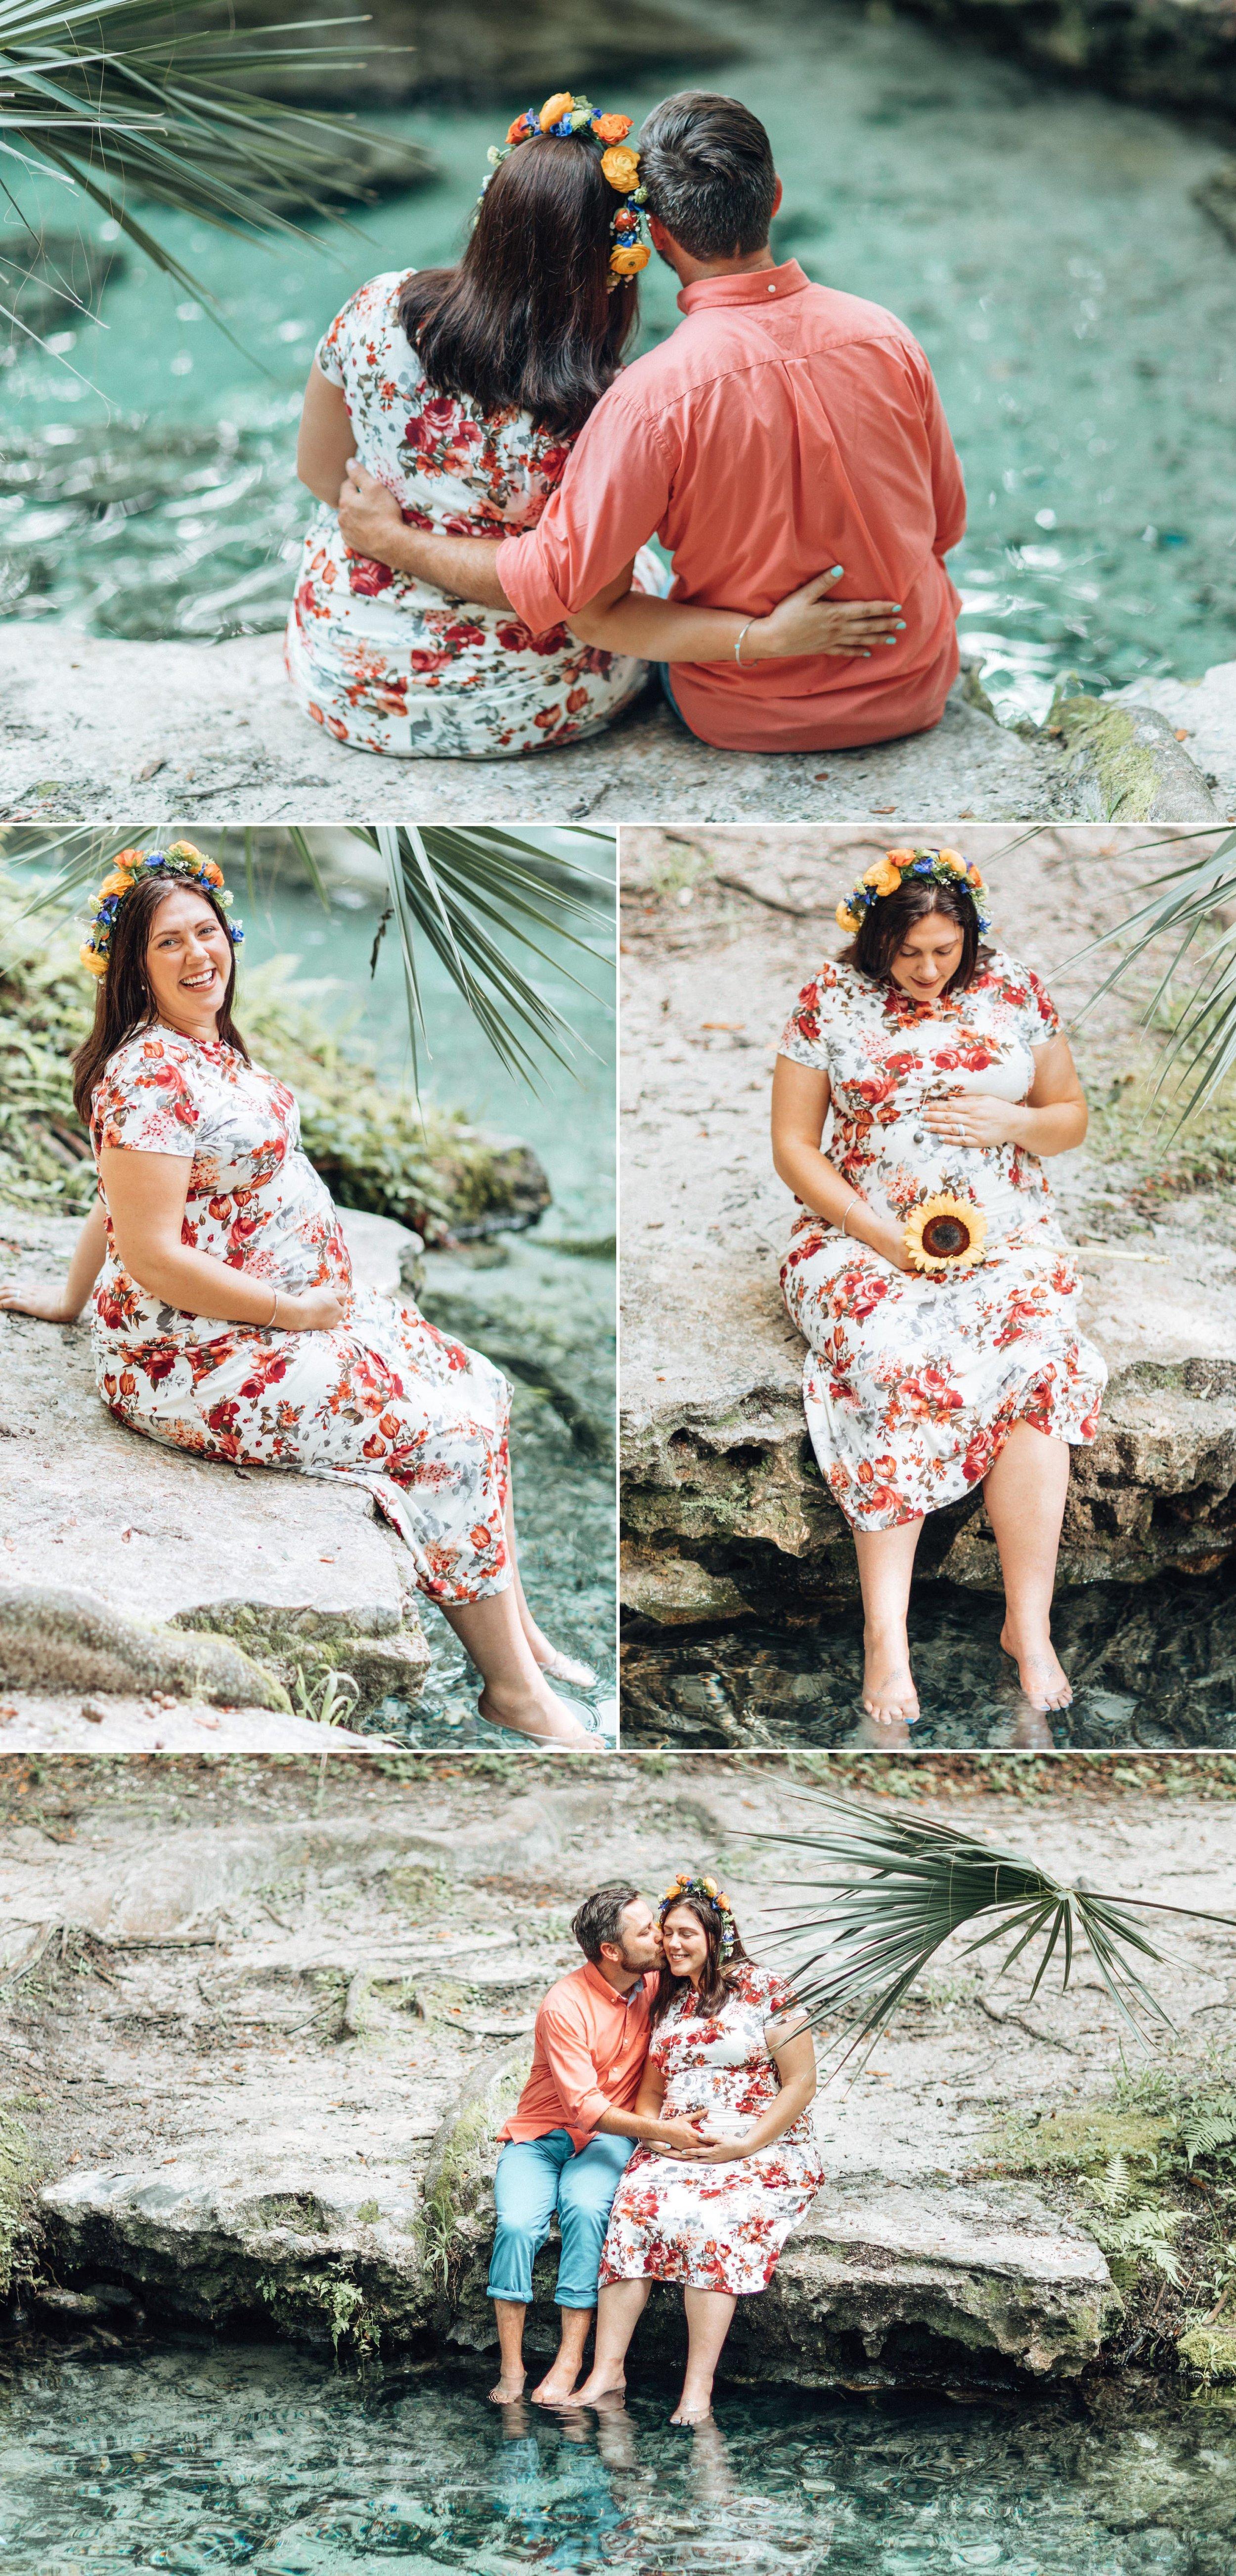 Boho Florida Maternity Photo Session- Kelly Springs State Park-Meghan+Michael3.jpg